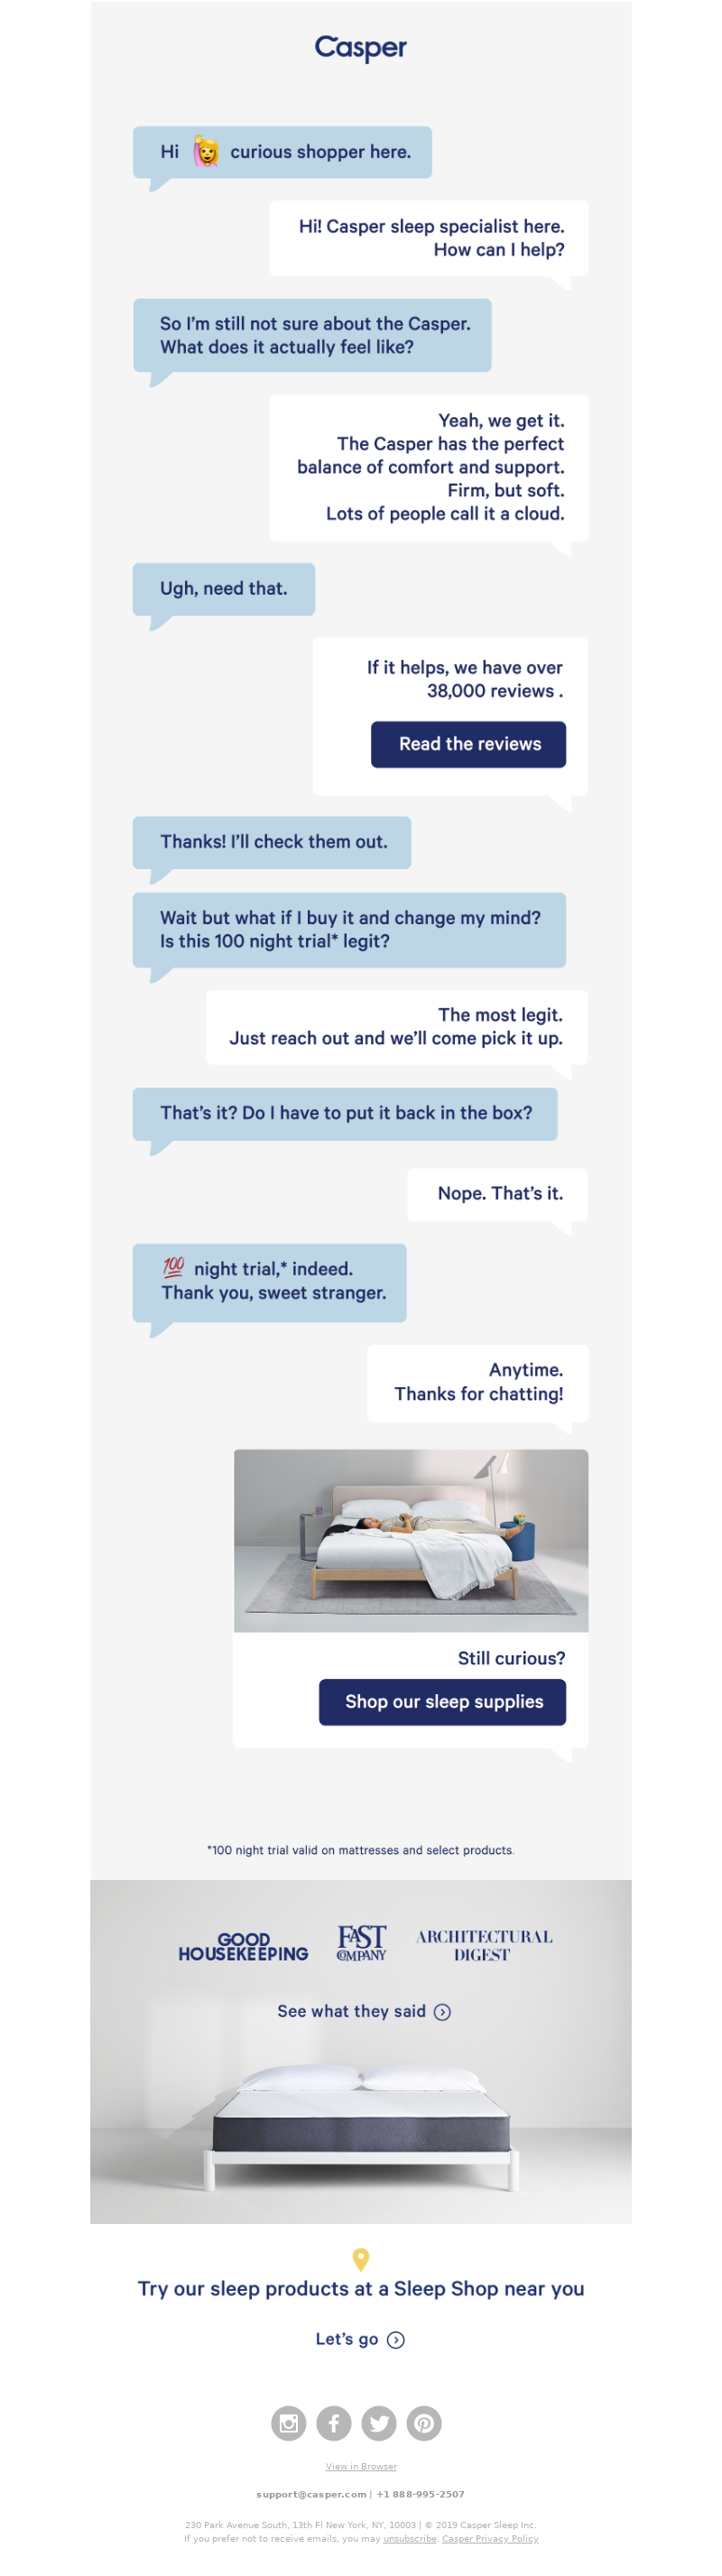 Casper - You Have 1 New Message from Casper